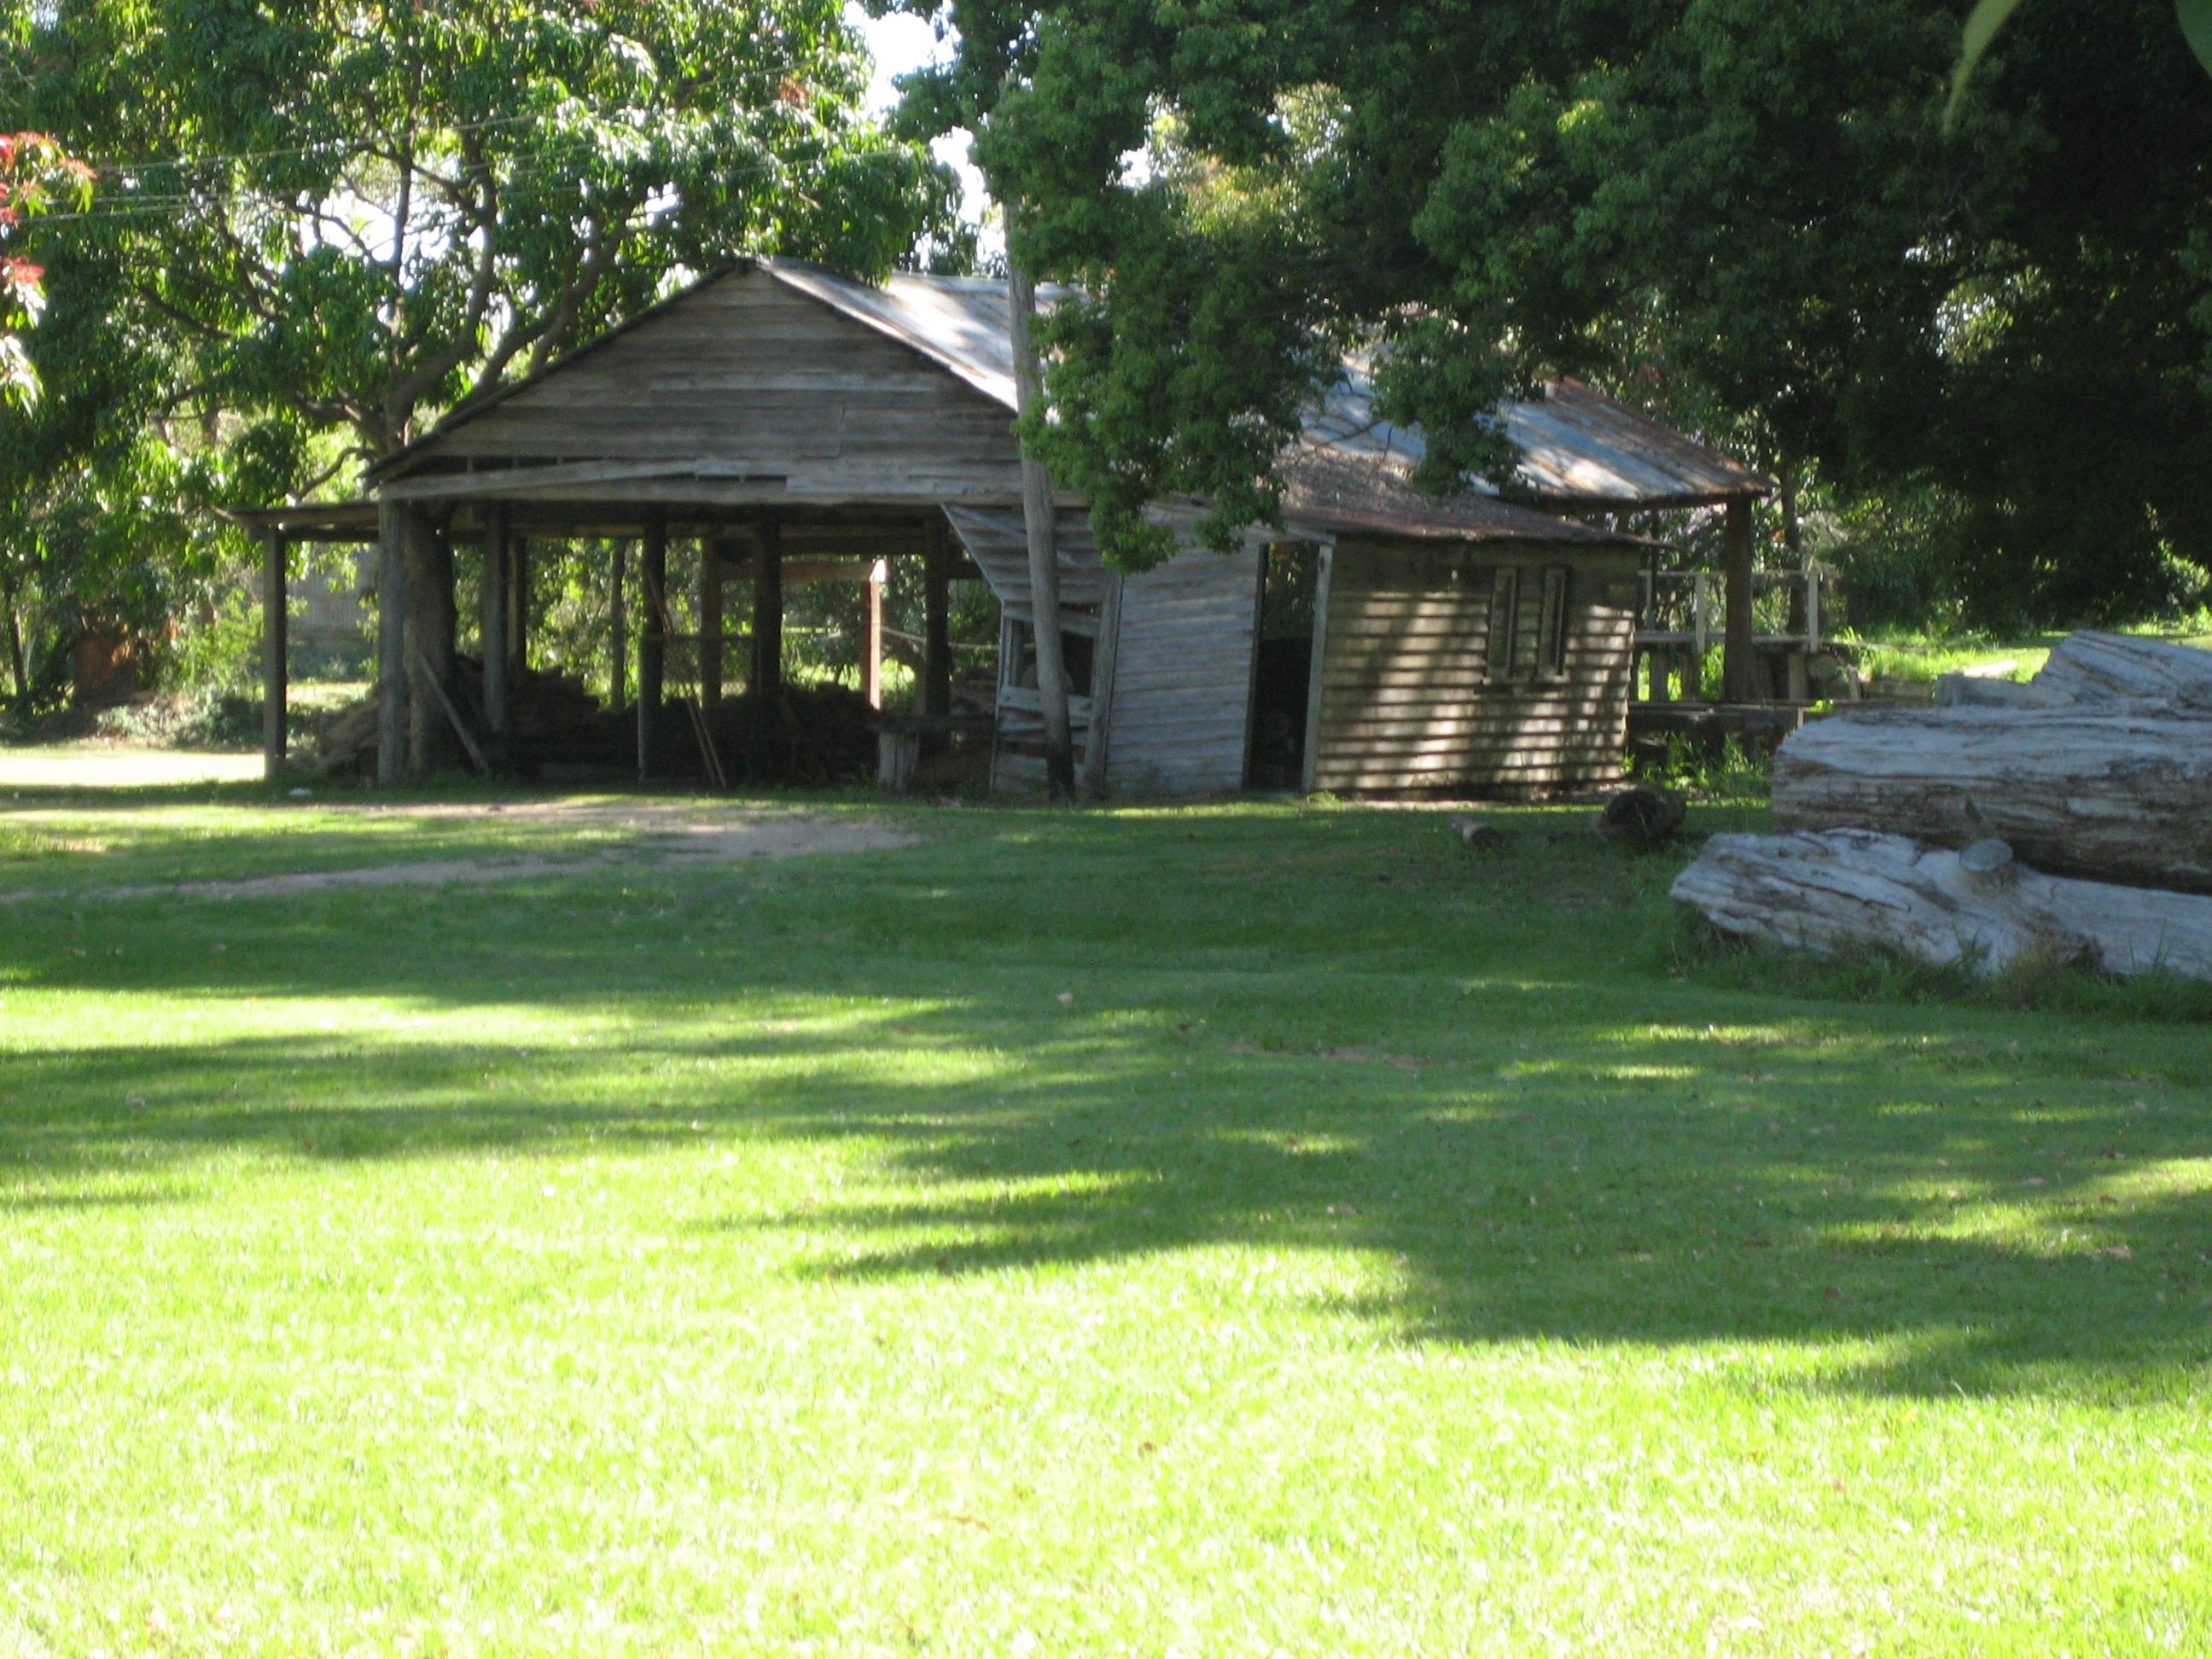 File:Cabbage Tree Creek Sawmill JPG - Wikimedia Commons